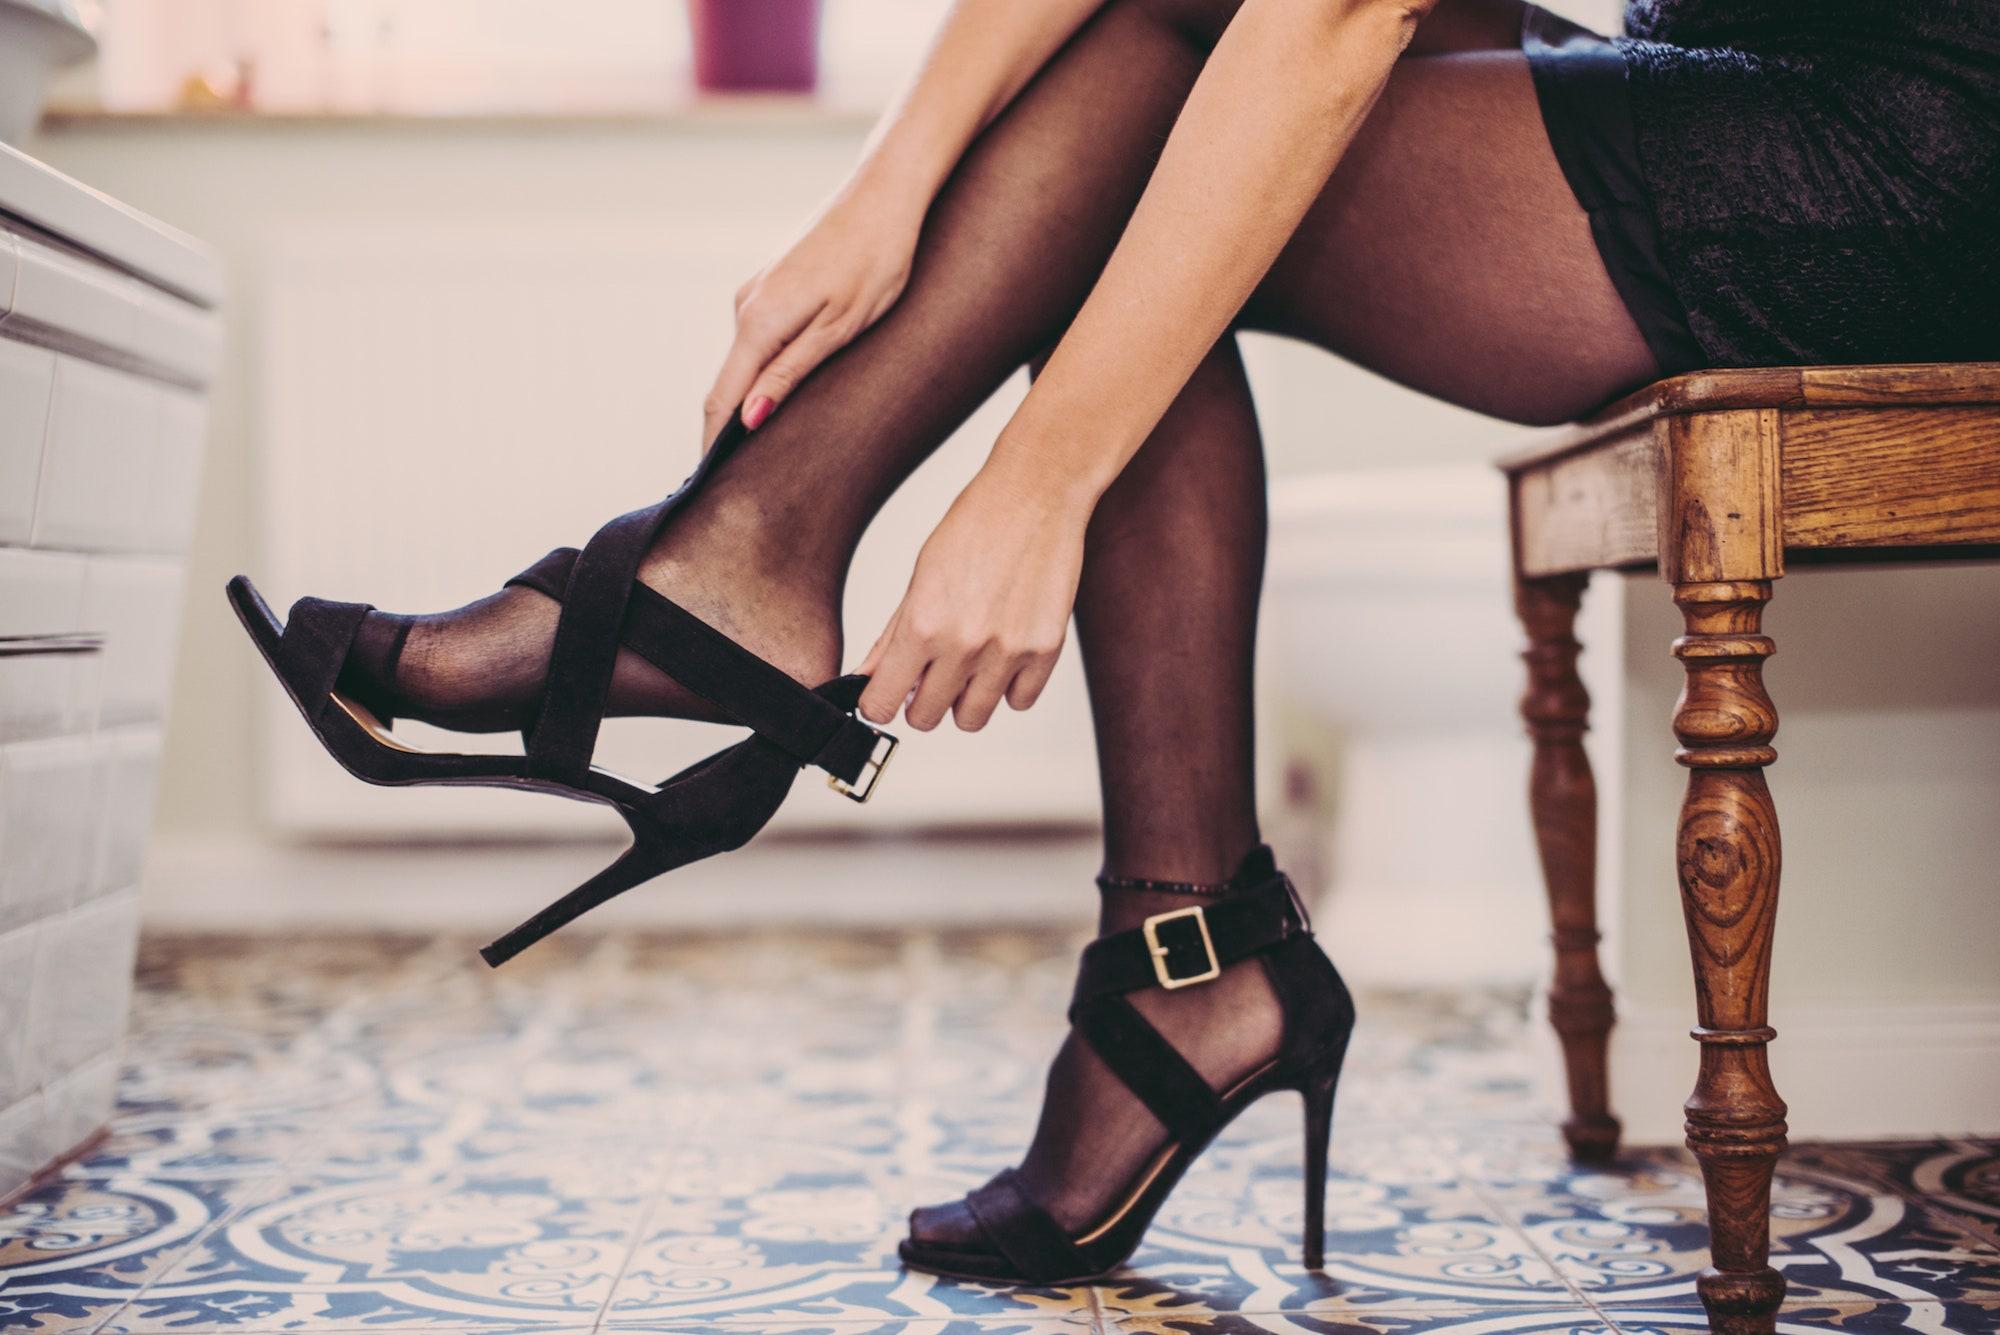 فتیش پا کفش پاشنه بلند